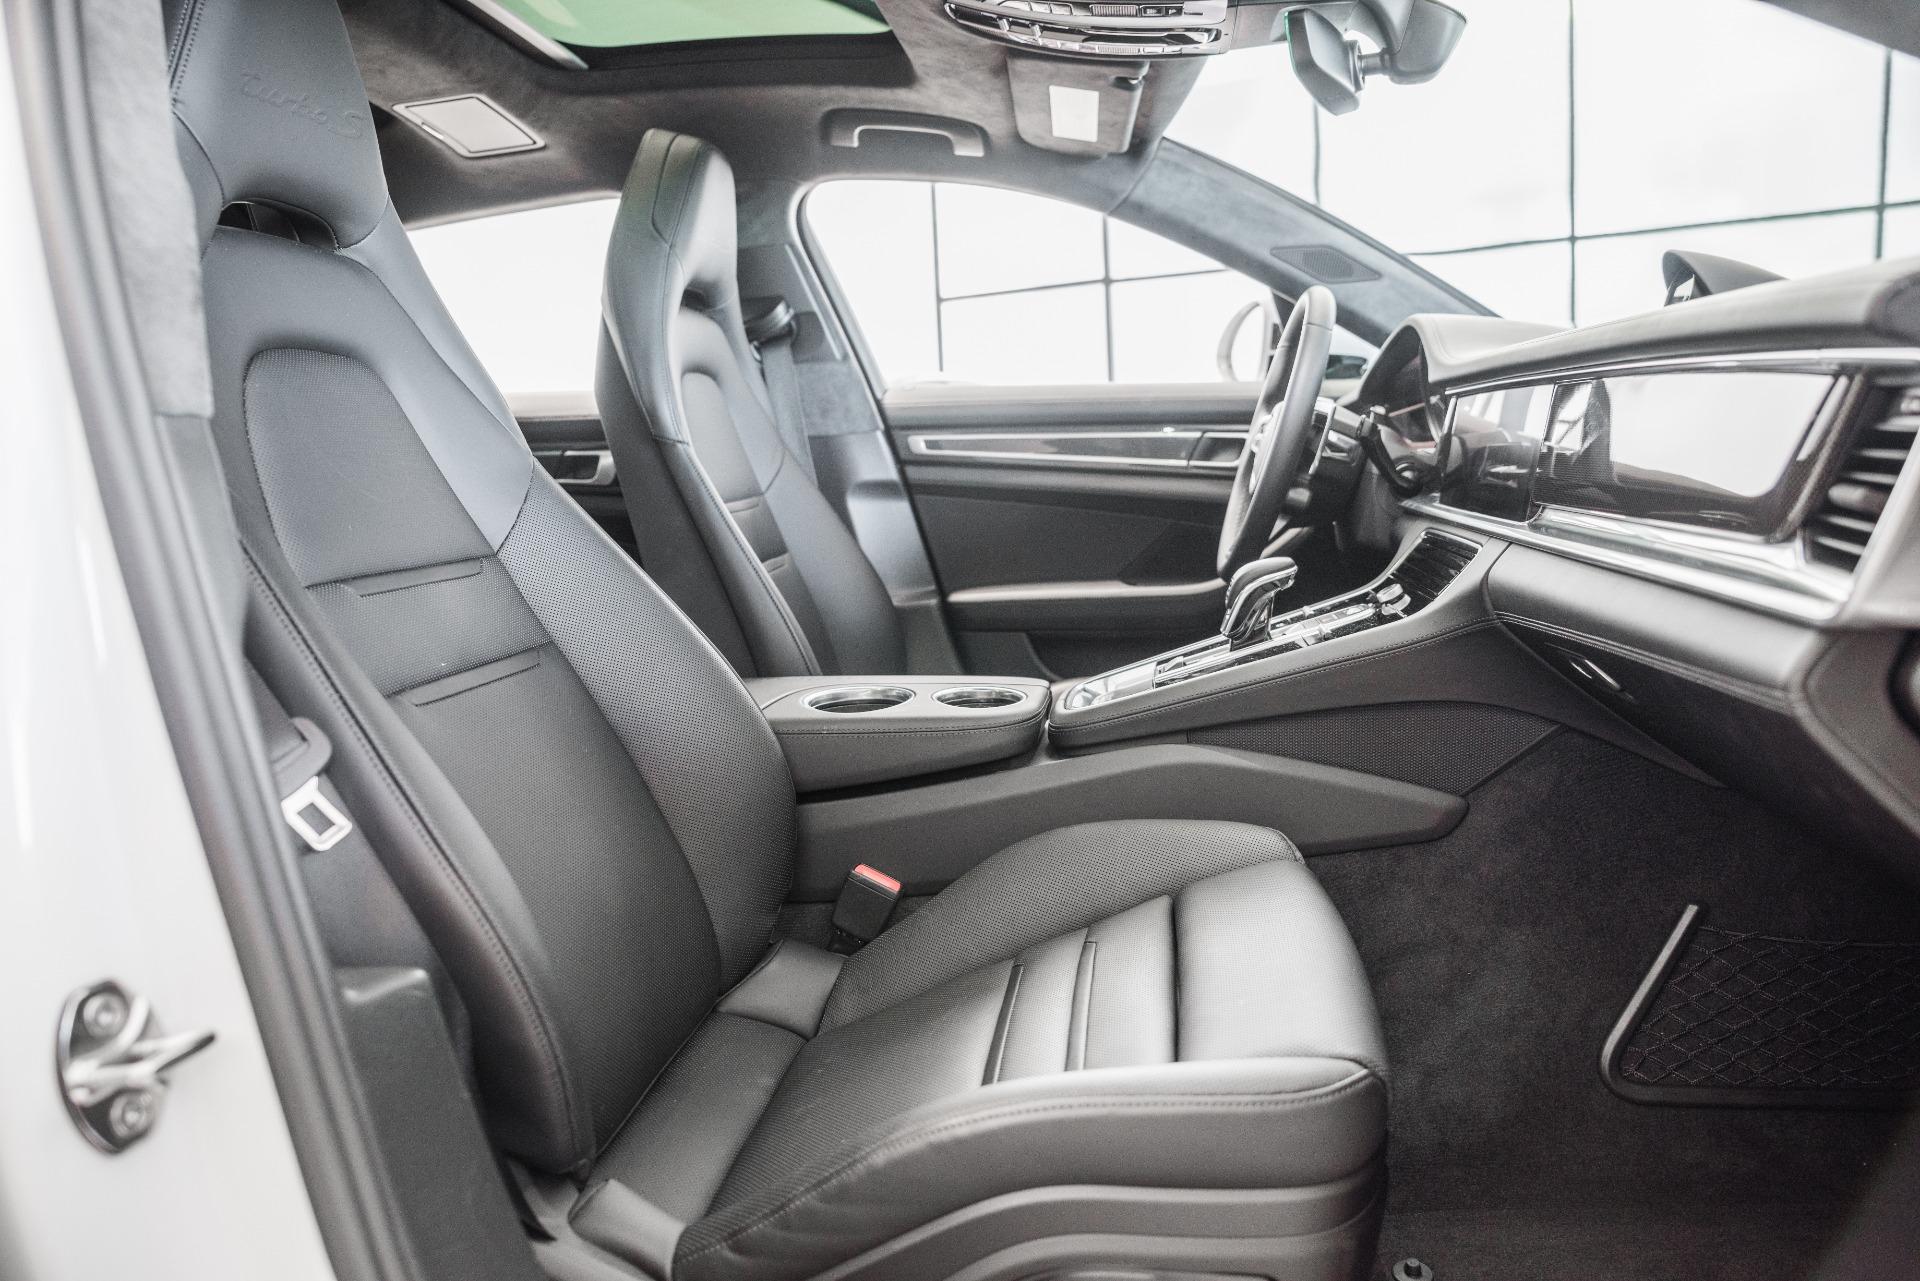 Used-2018-Porsche-Panamera-Turbo-S-E-Hybrid-Executive